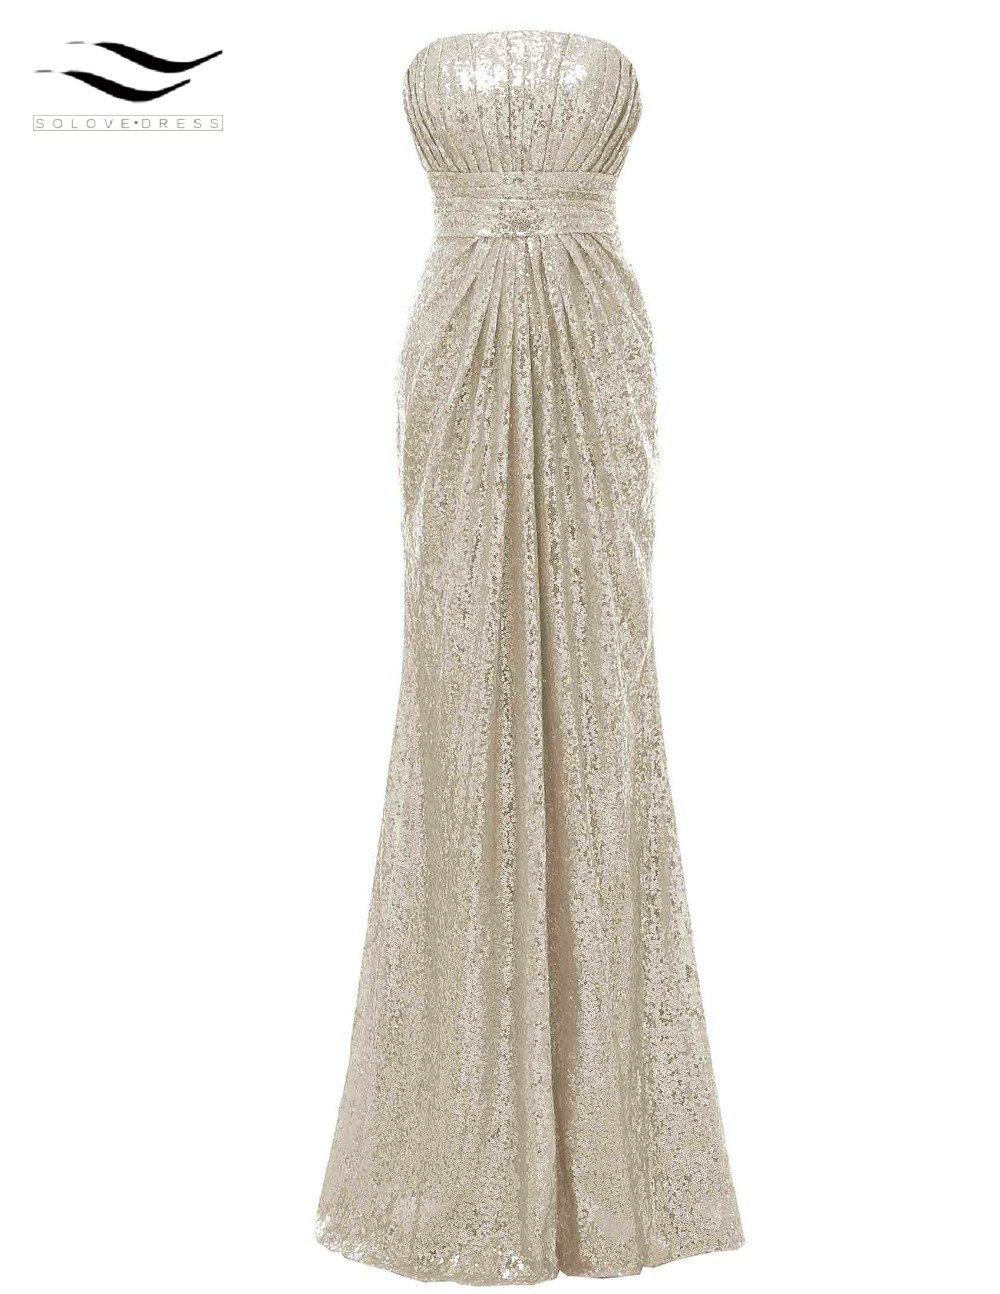 Solovedress Off The Shoulder Mermaid Sequined Elegant Strapless Bridesmaid Dress 2018 Real Formal Vestido De Dama De Honra B0063